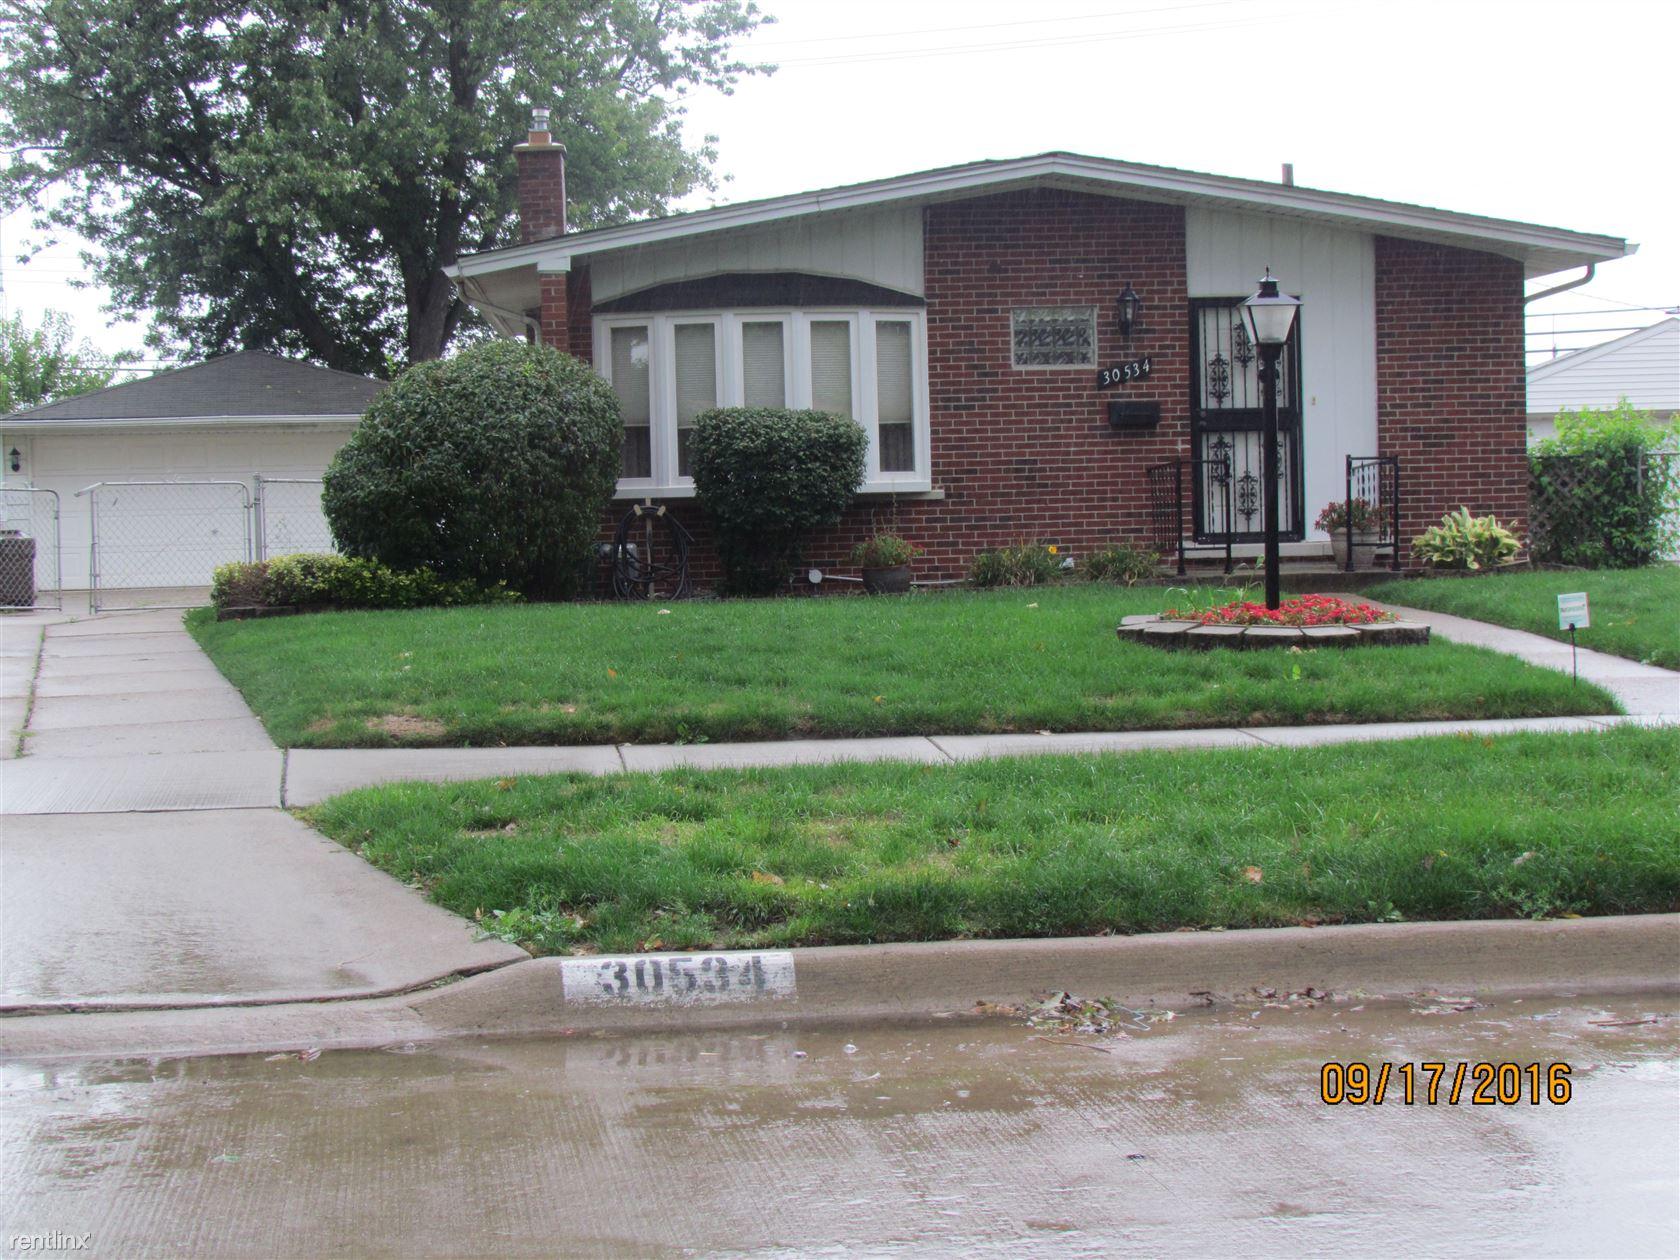 30534 Garry Ave